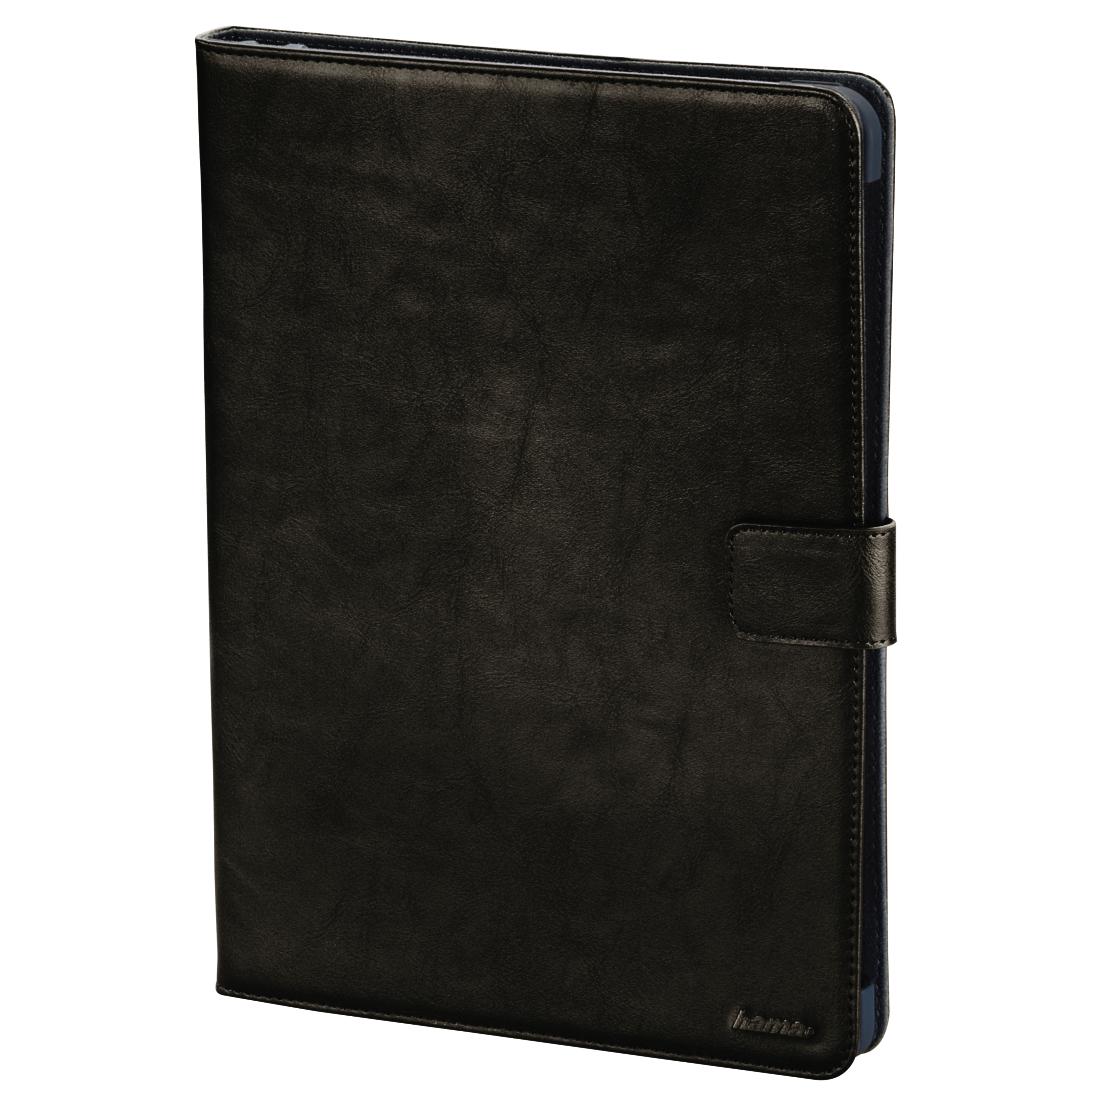 00106457 hama tablet case noble f r apple ipad 9 7 2017. Black Bedroom Furniture Sets. Home Design Ideas